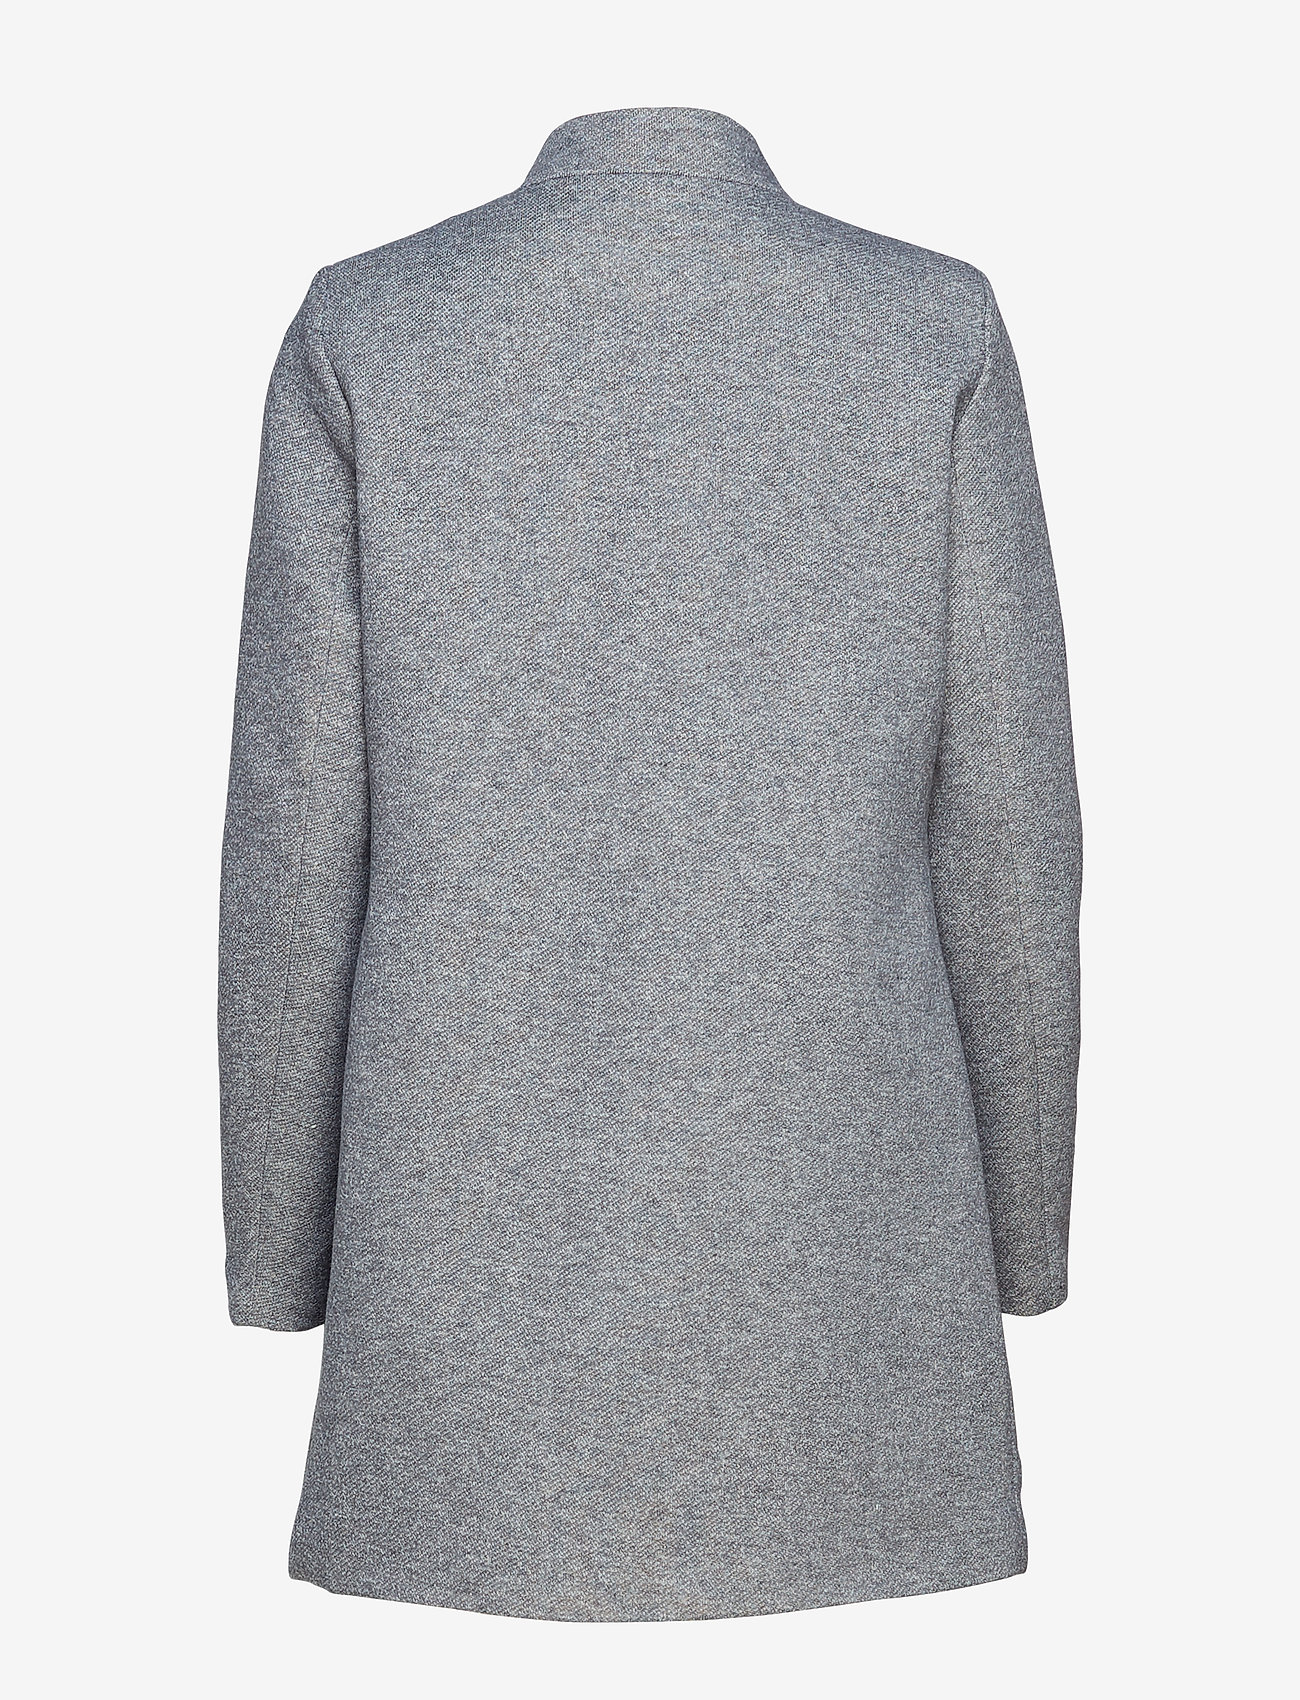 ONLY - ONLSOHO COATIGAN OTW NOOS - dunne jassen - light grey melange - 1